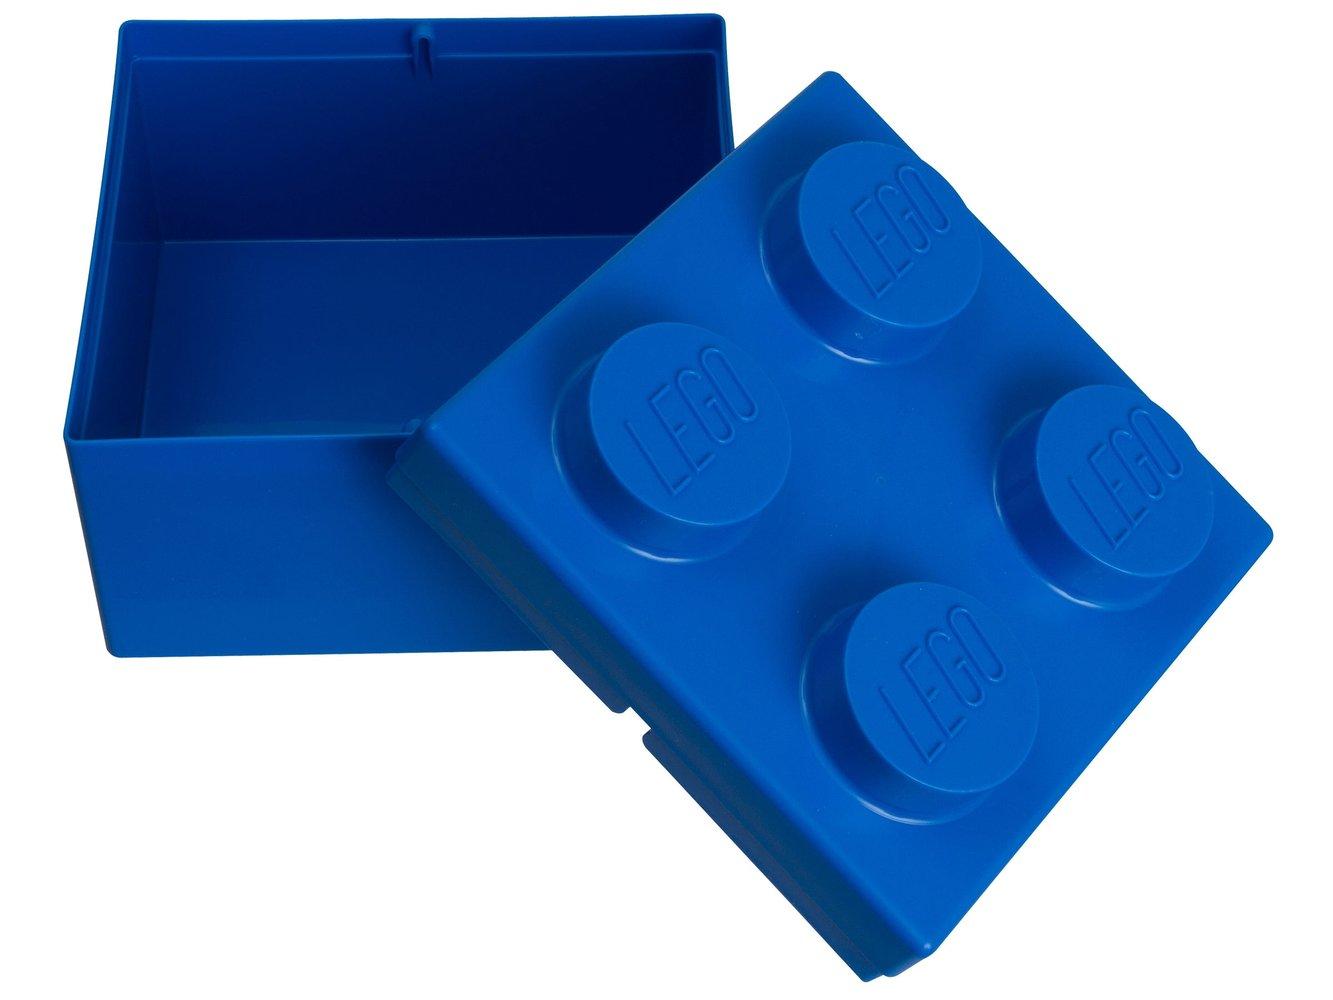 2x2 Storage Brick (Blue)